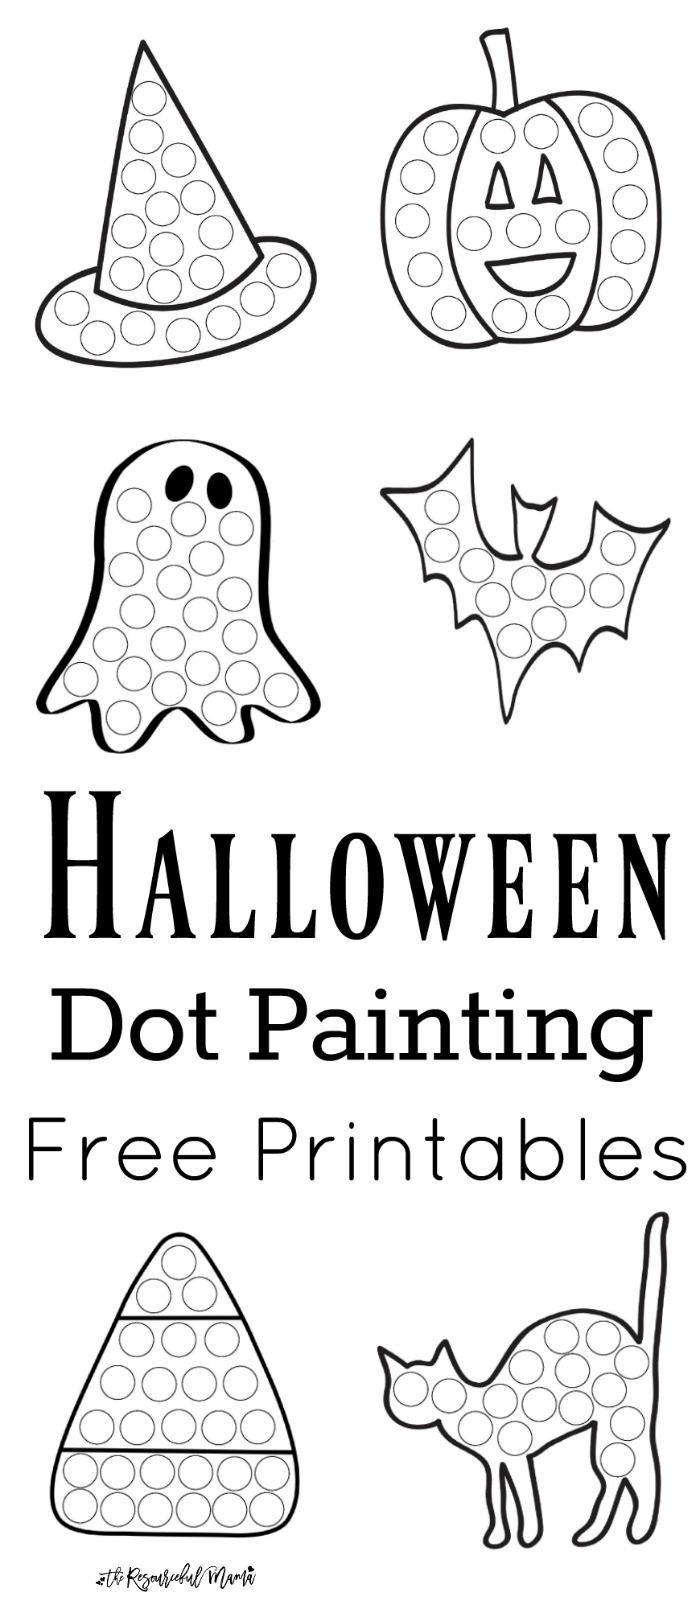 Halloween Dot Painting {Free Printables} | Halloween | Painting - Free Printable Halloween Activities